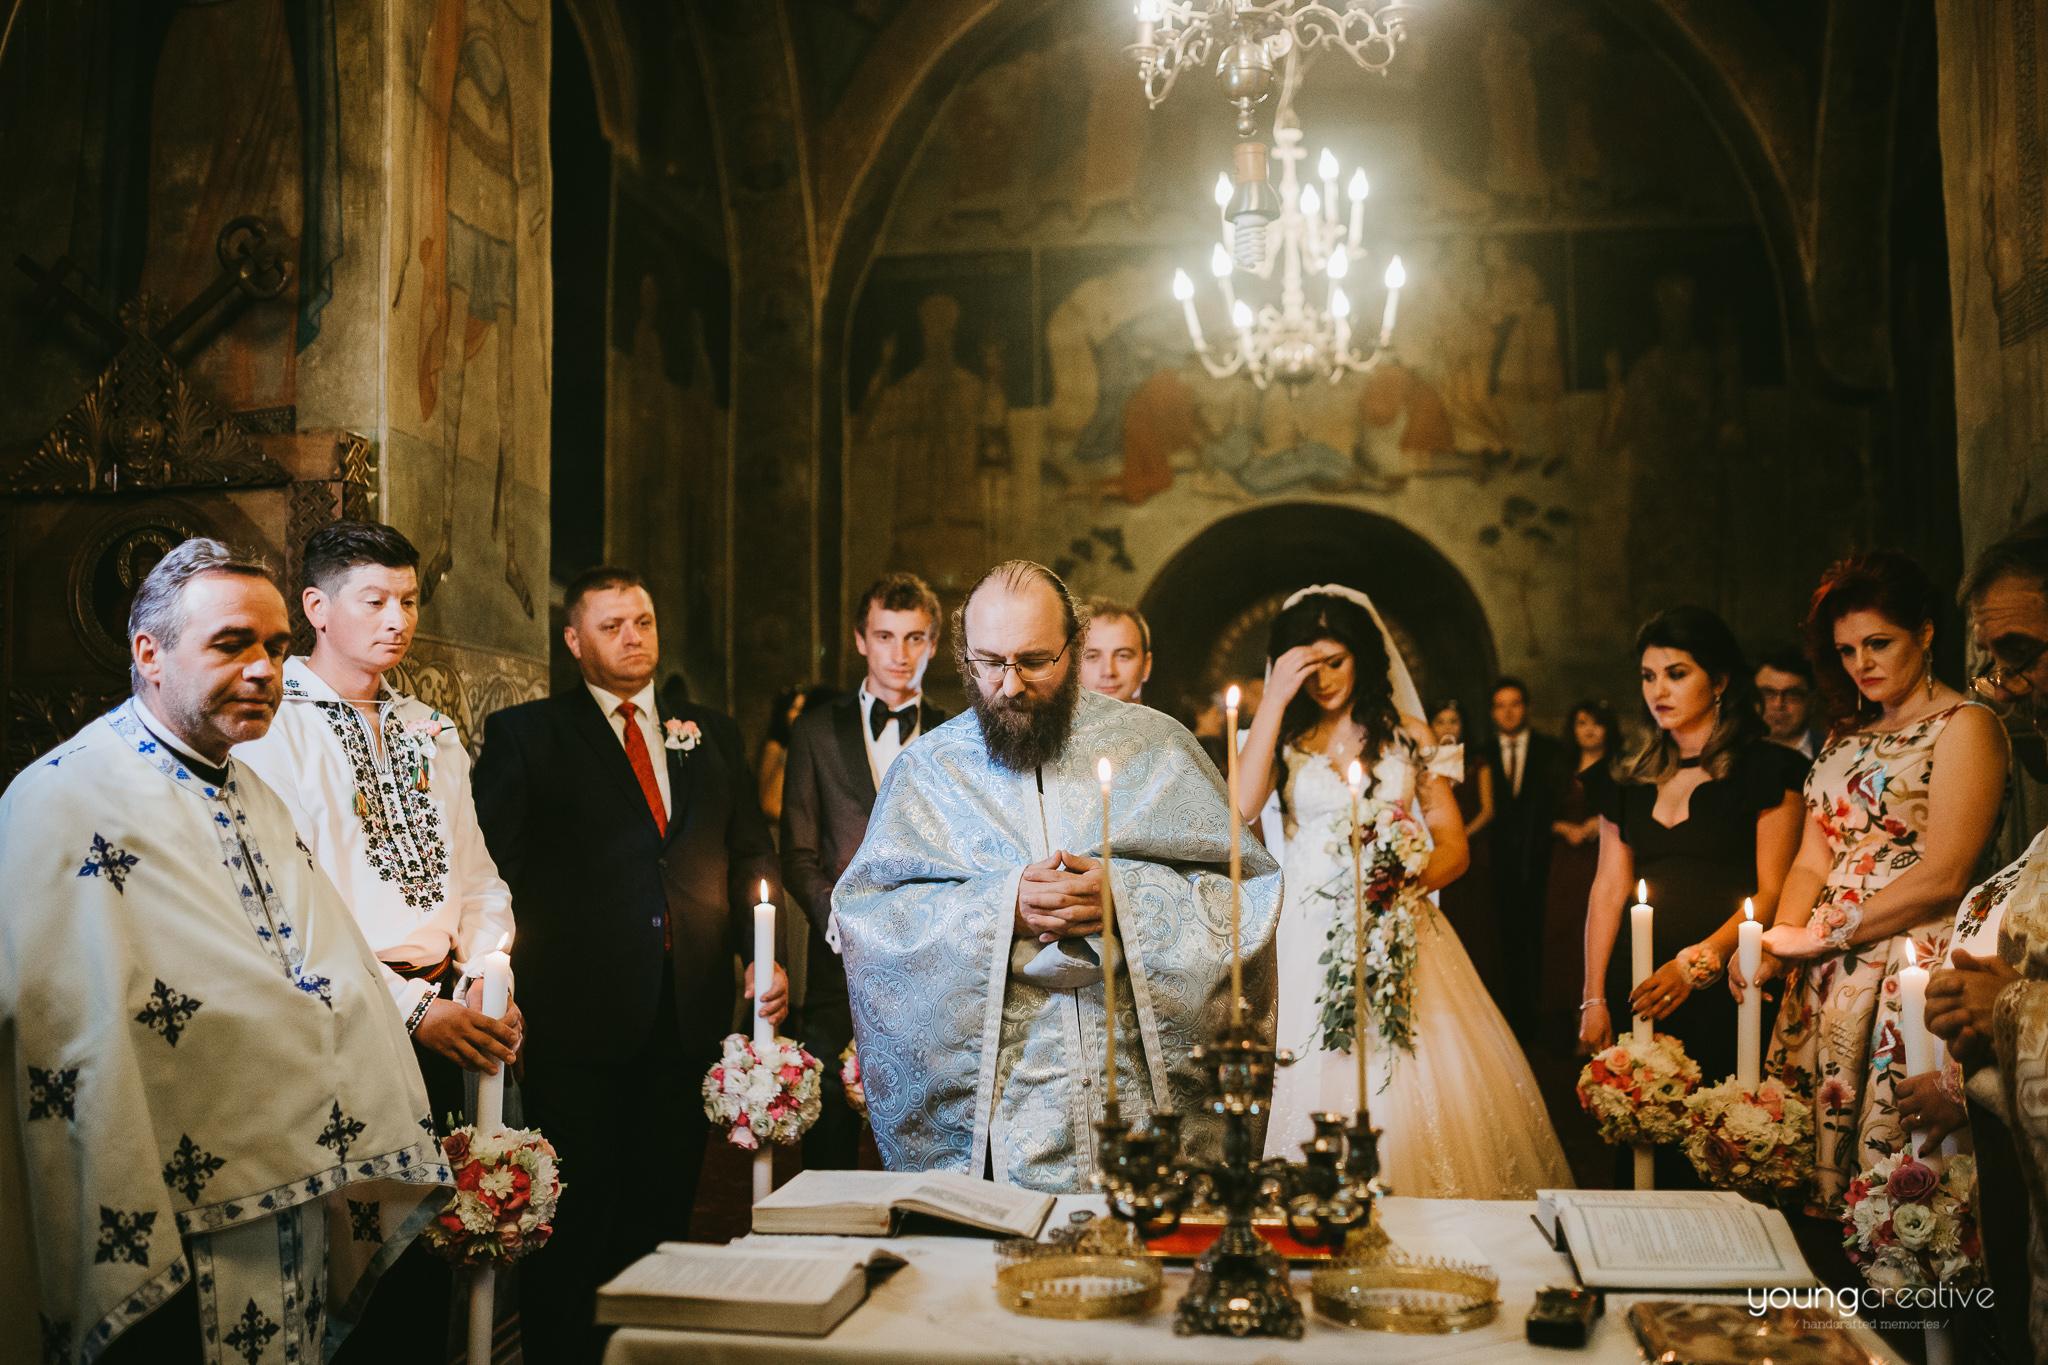 Victorita & Mihai | youngcreative.info media © Dan Filipciuc, Cristina Bejan | fotografie de nunta Suceava